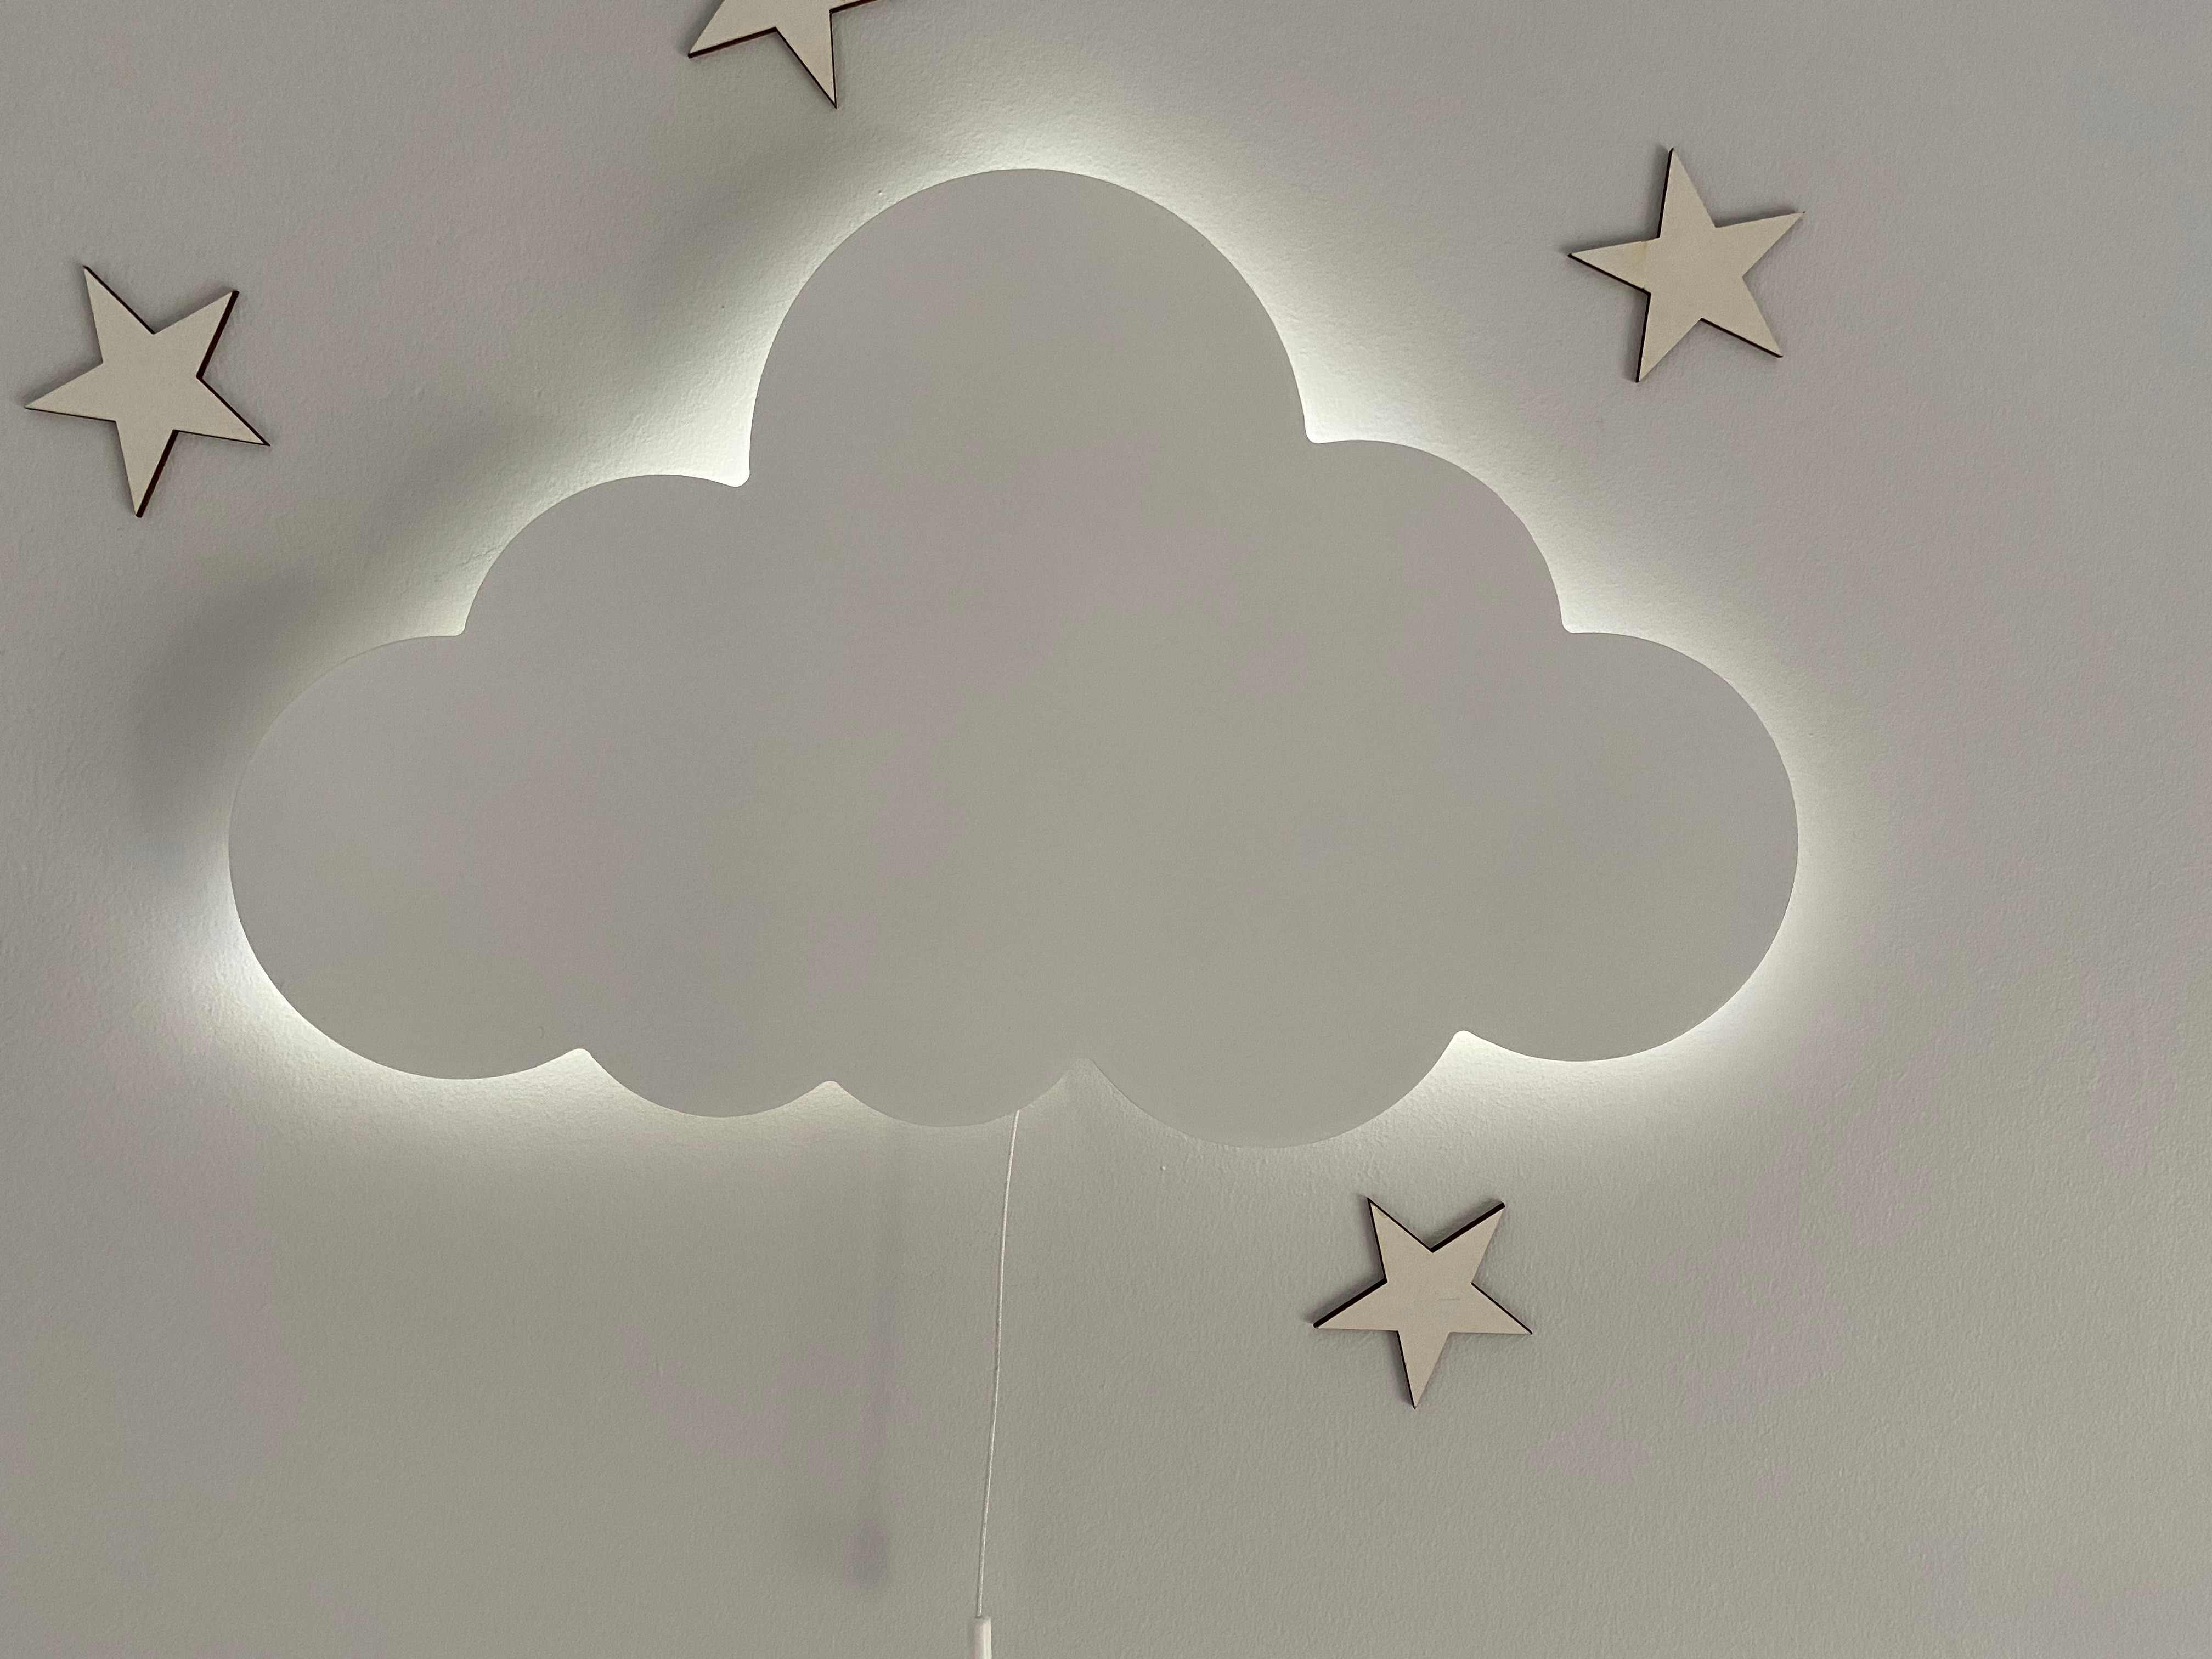 Set of 2- Nursery Wall Lamp, Cloud Lamp, Children Bedroom Decor, Wooden Led Light, Baby Night Lamp, My Childs Room Decor enlarge